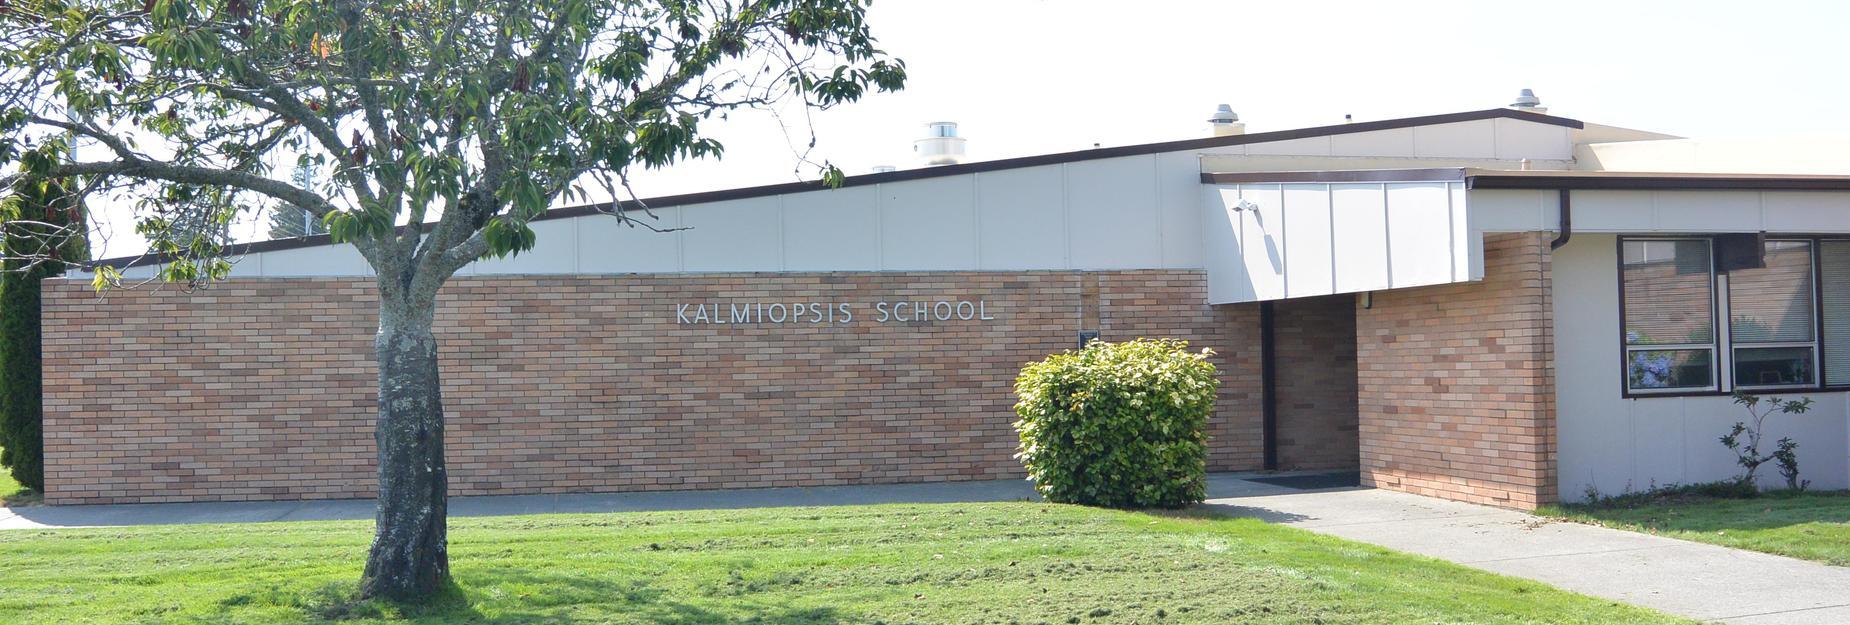 Photo of front of Kalmiopsis Elementary